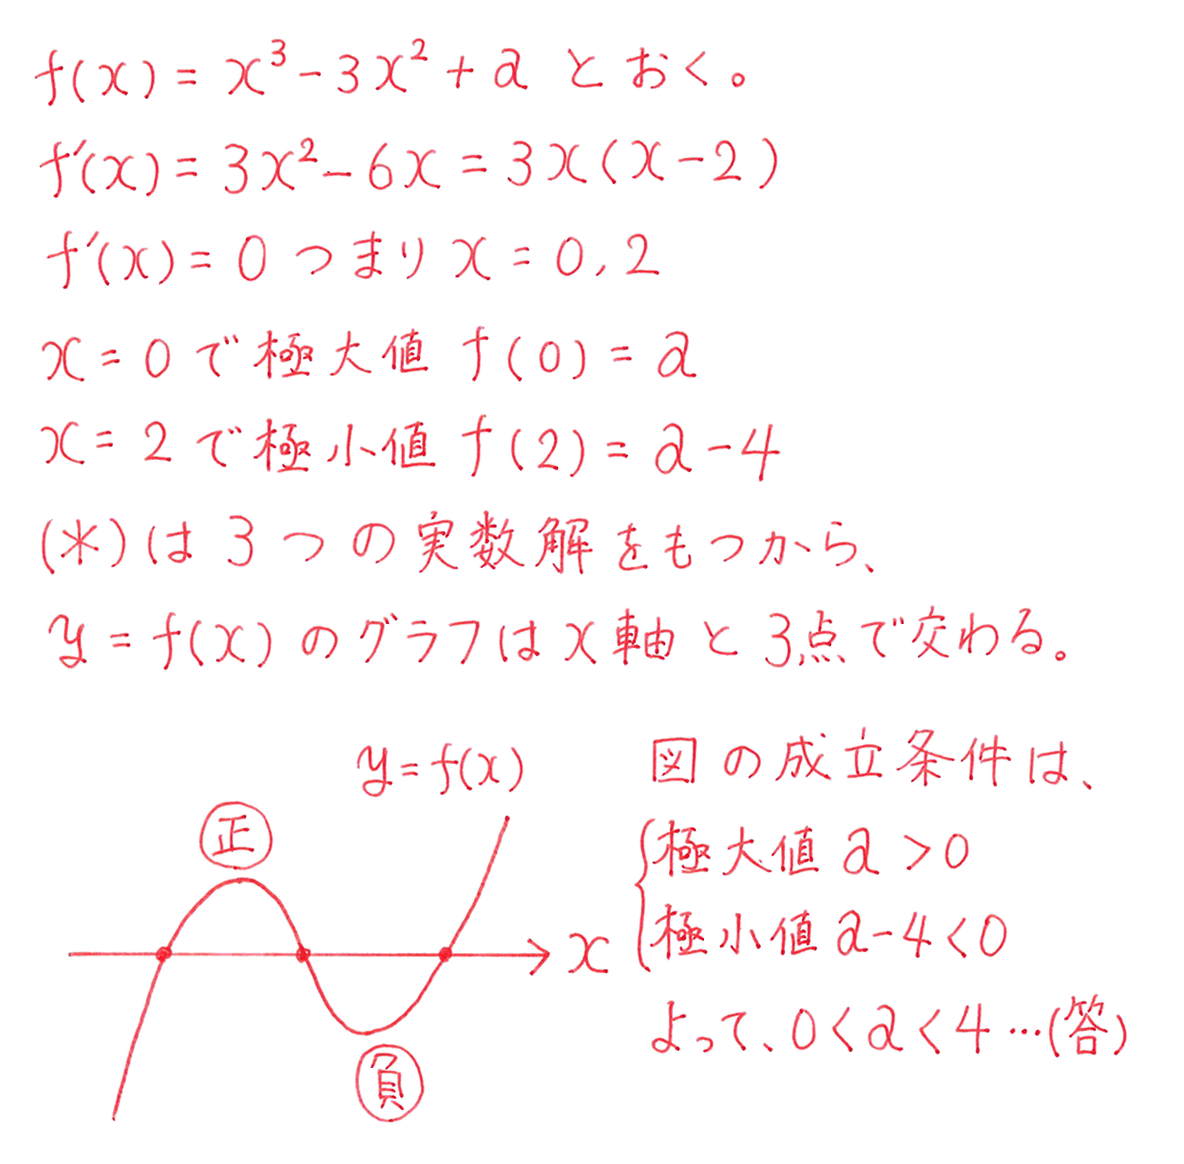 高校数学Ⅱ 微分法と積分法15 練習 答え